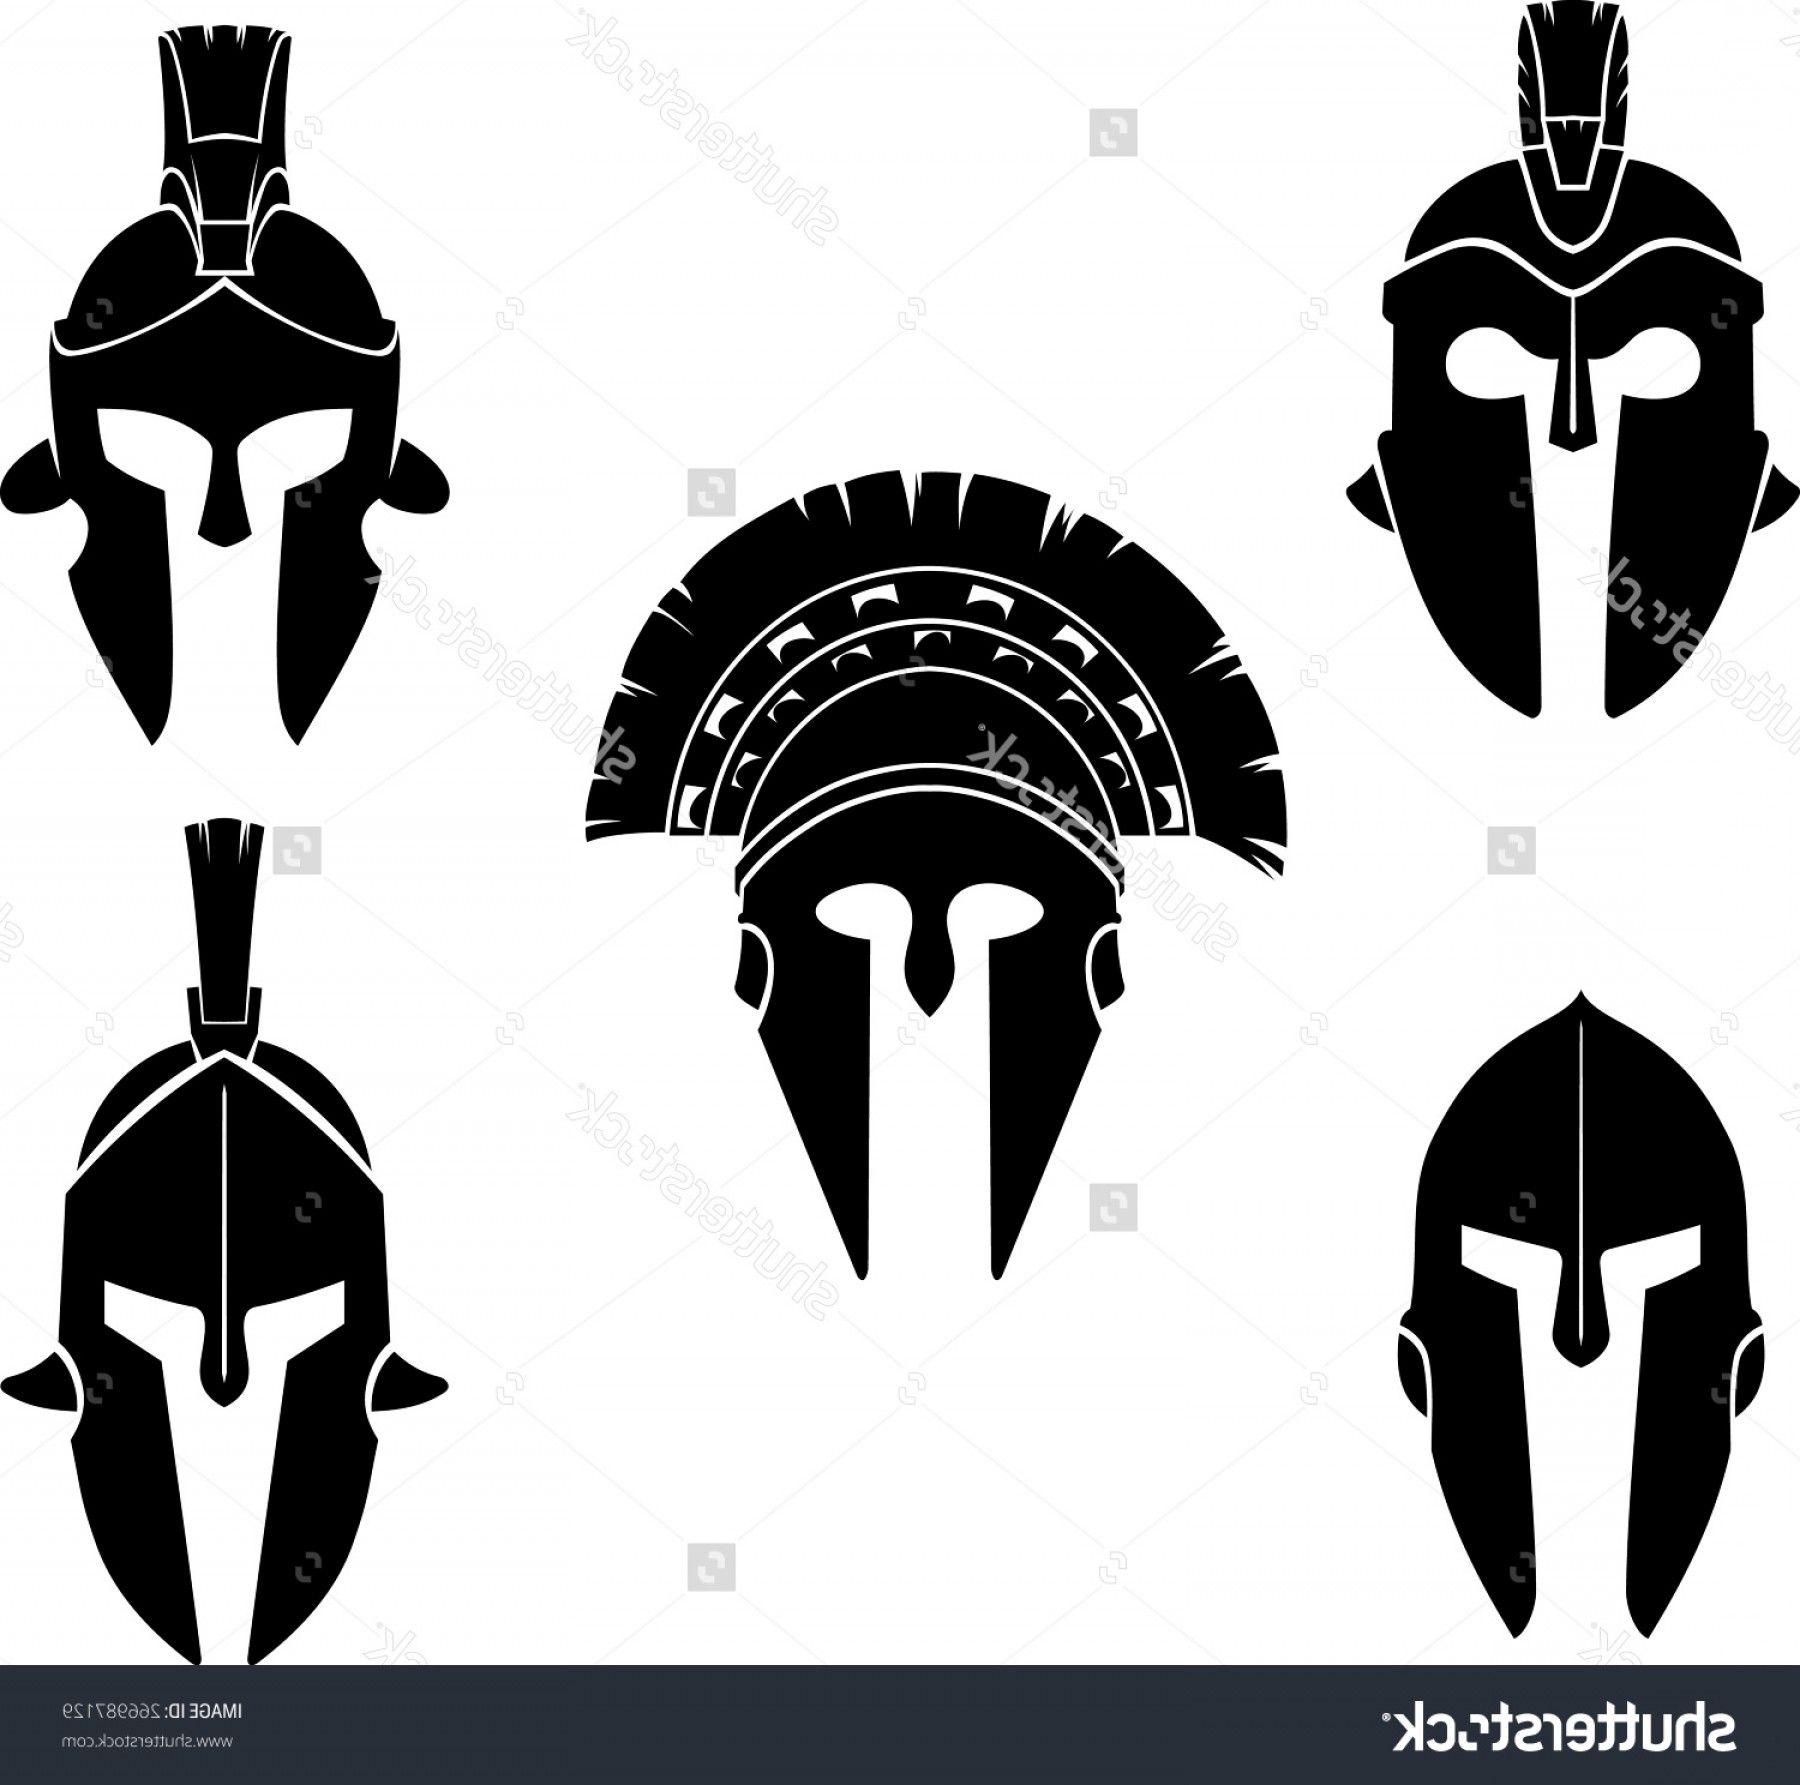 Excellent Spartan Vector Art Draw HD Spartan Helmet Clip